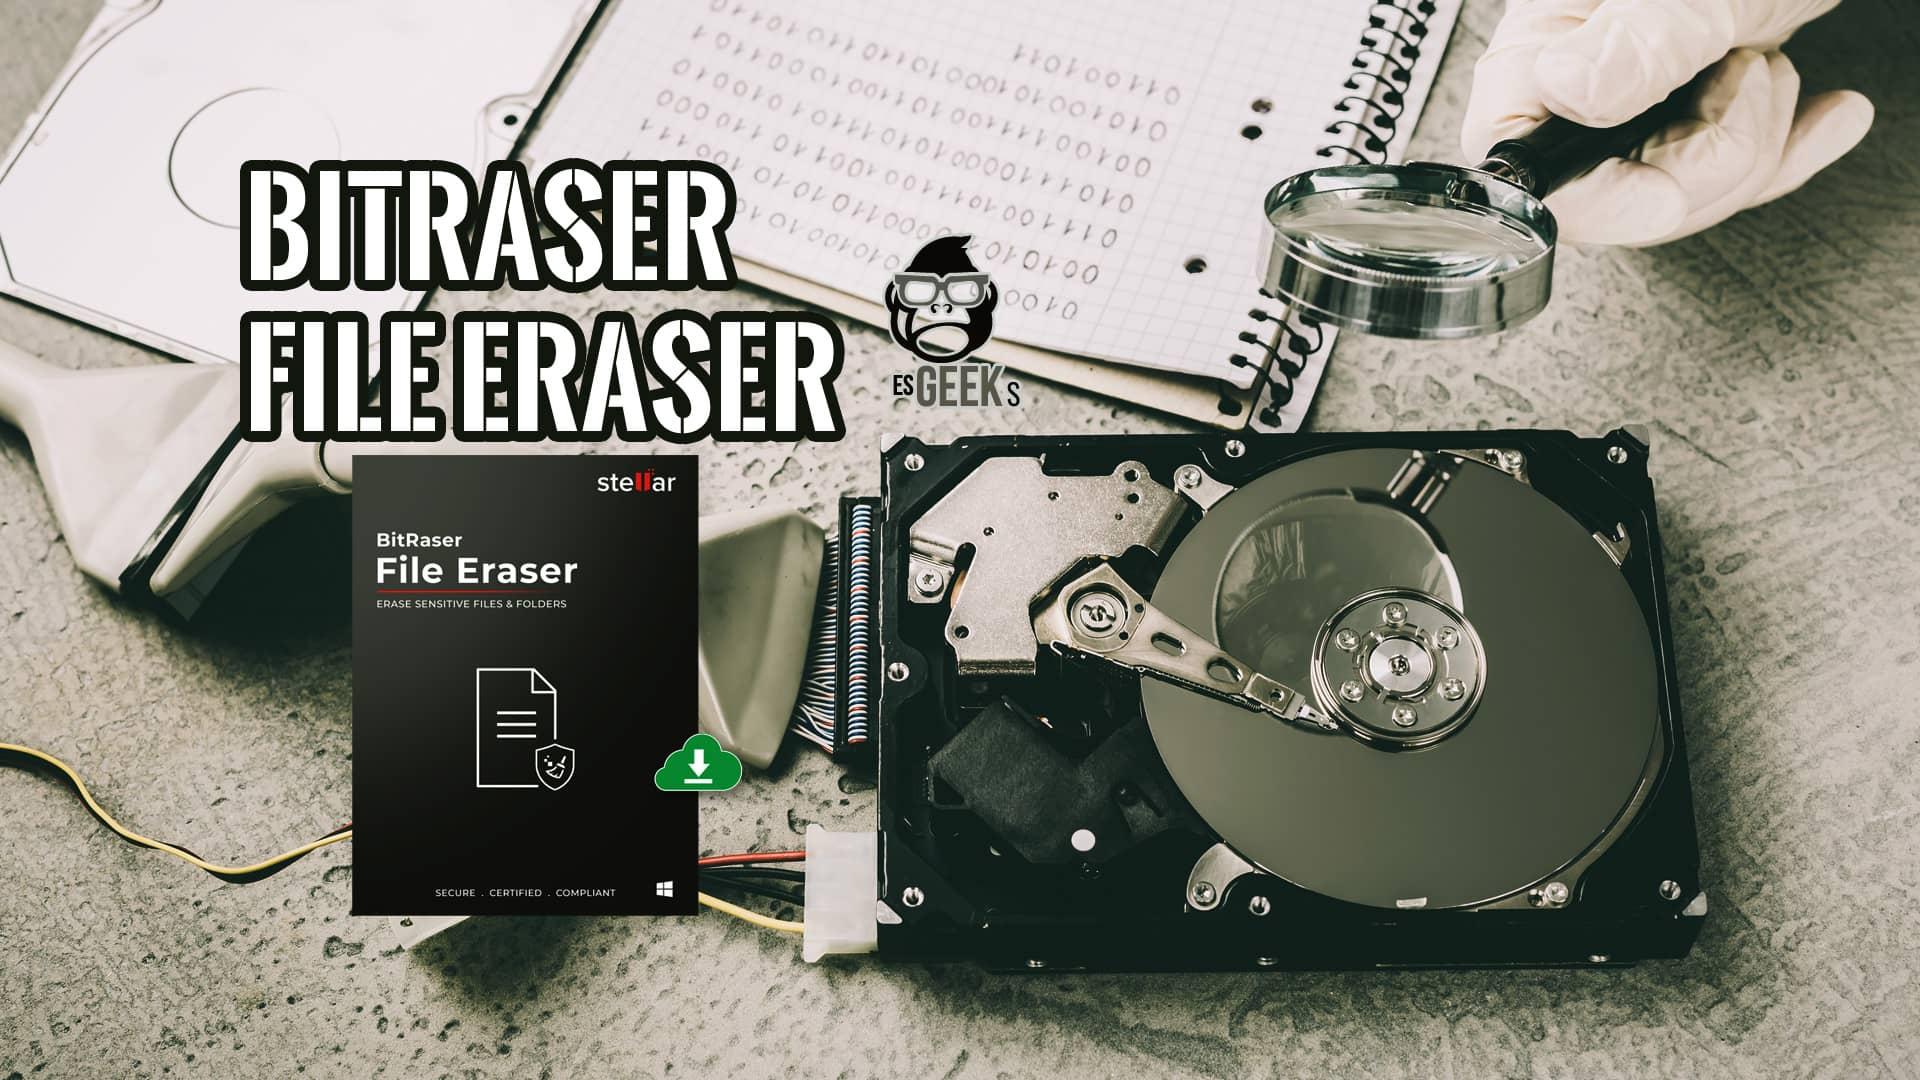 BitRaser File Eraser Software para Borrar Archivos de Forma Segura